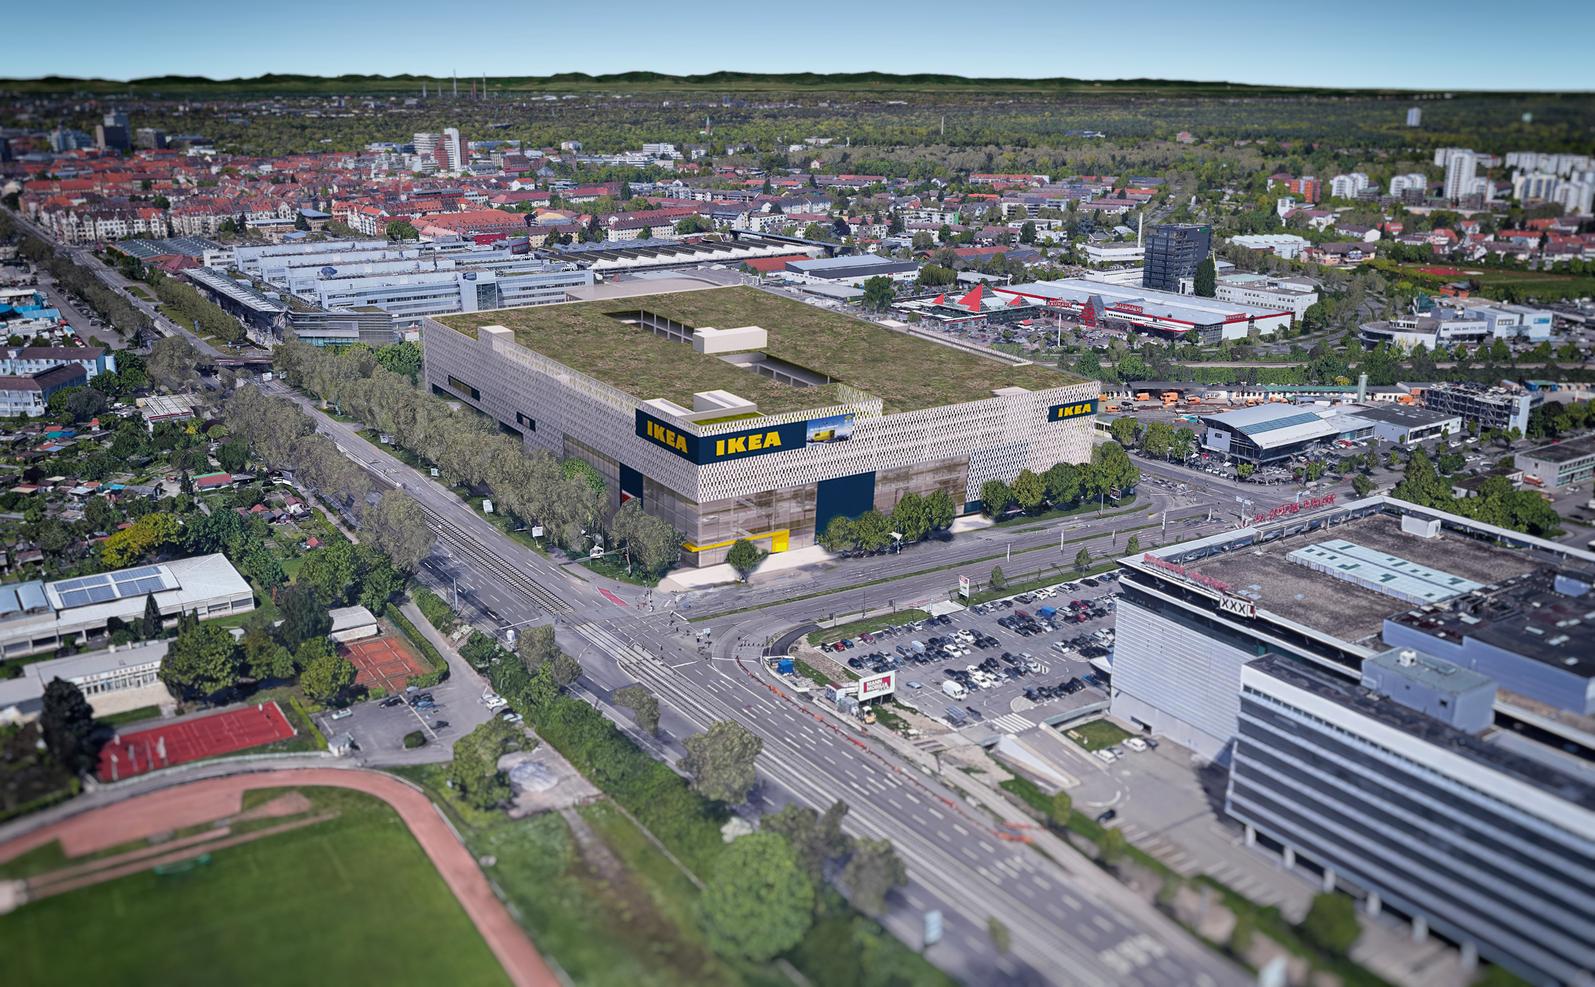 Wann Eröffnet Ikea Karlsruhe